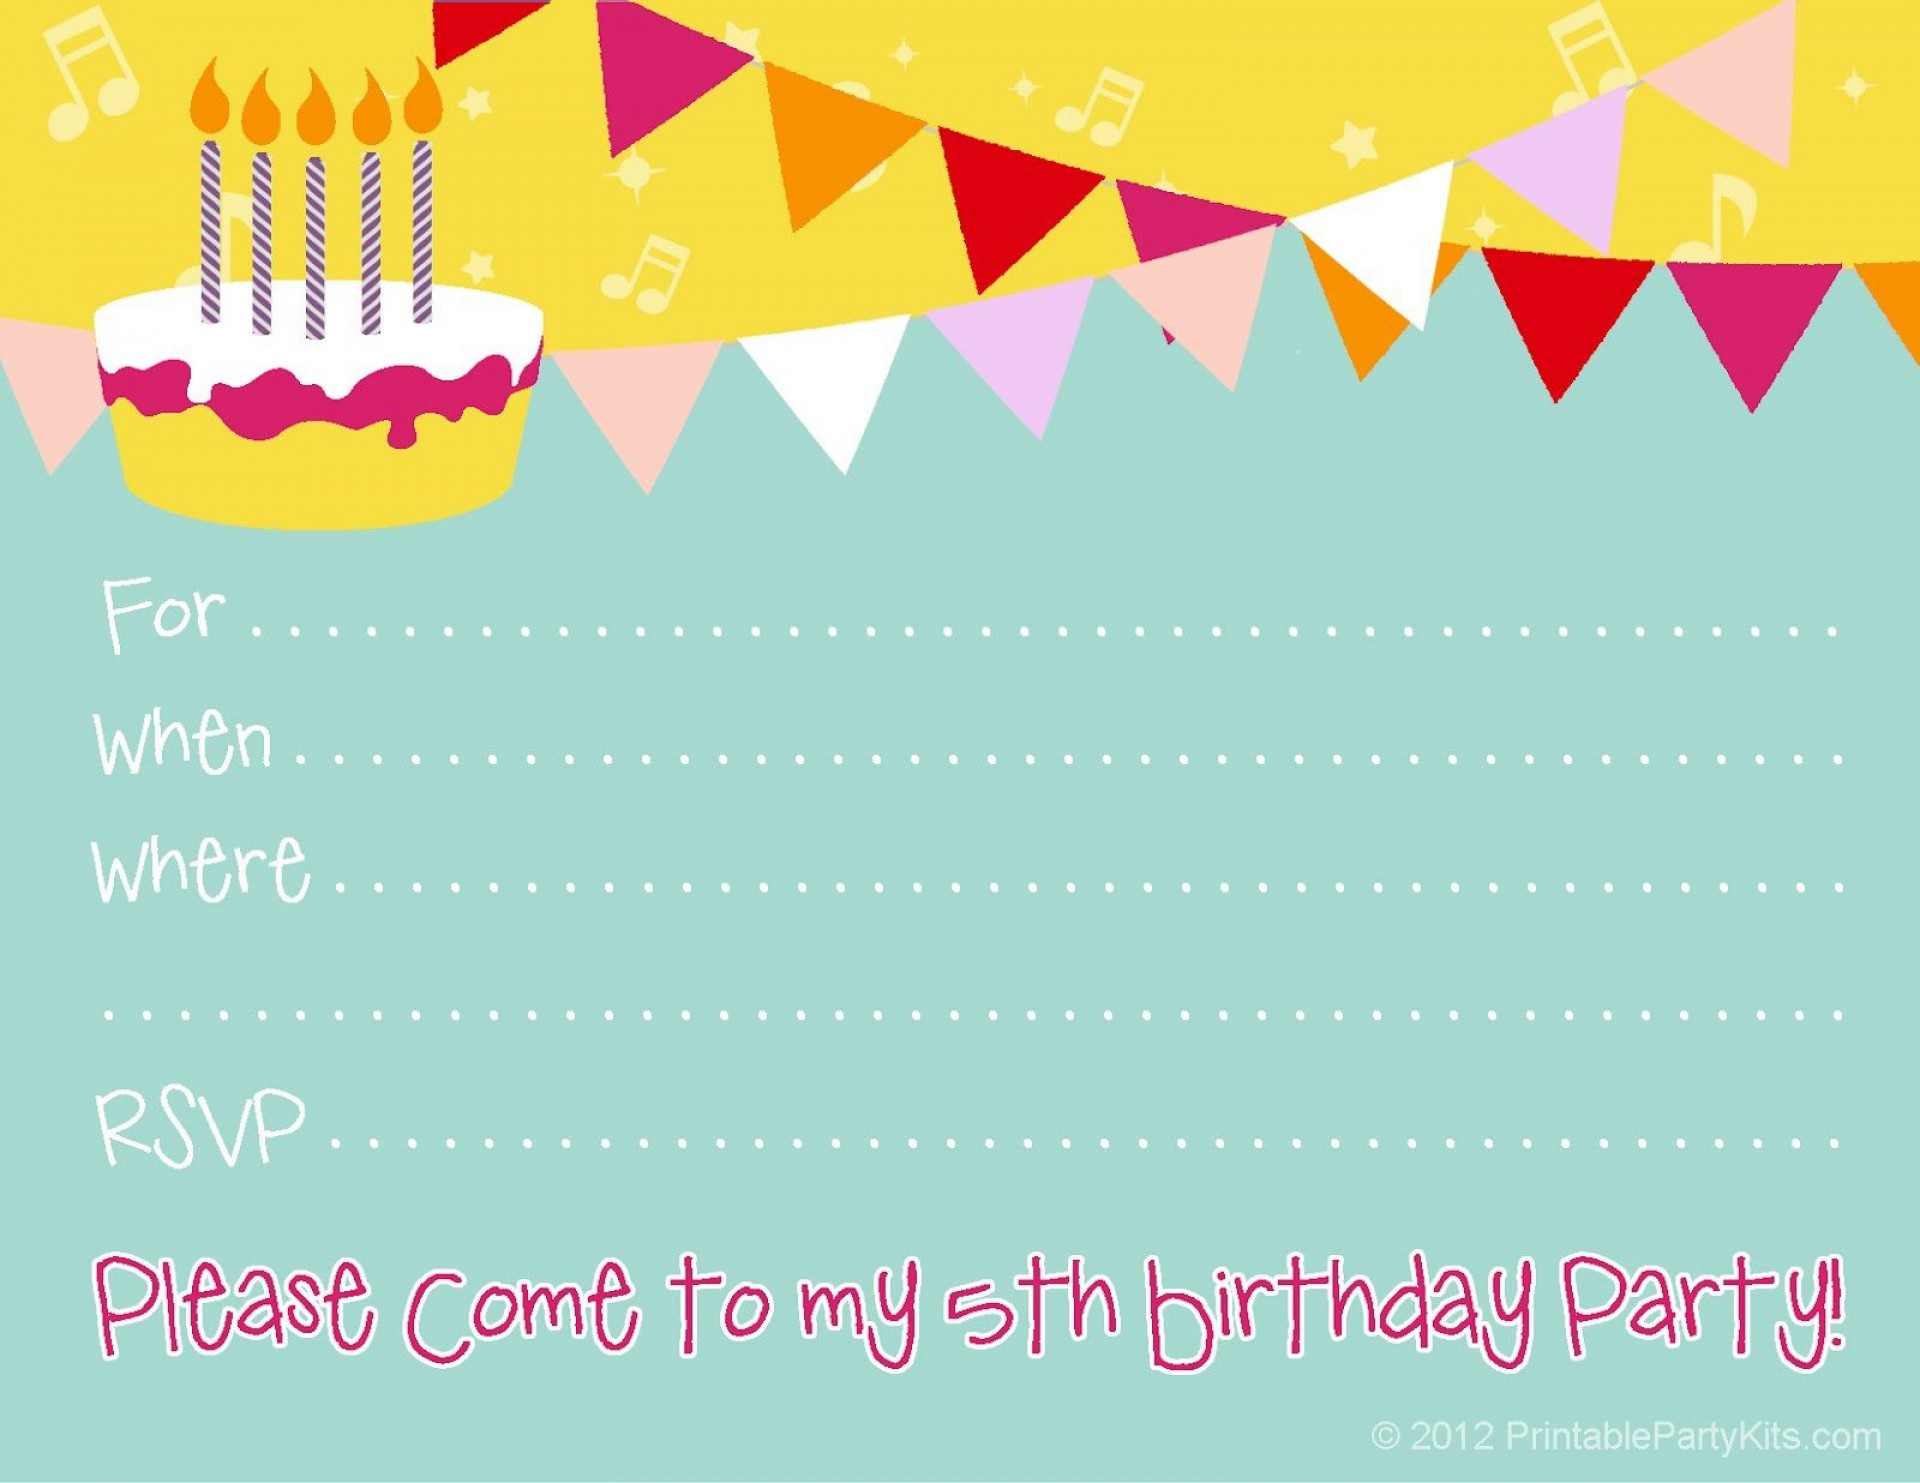 007 Stunning Free Birthday Party Invitation Template Example  Templates Printable 16th Australia Uk1920